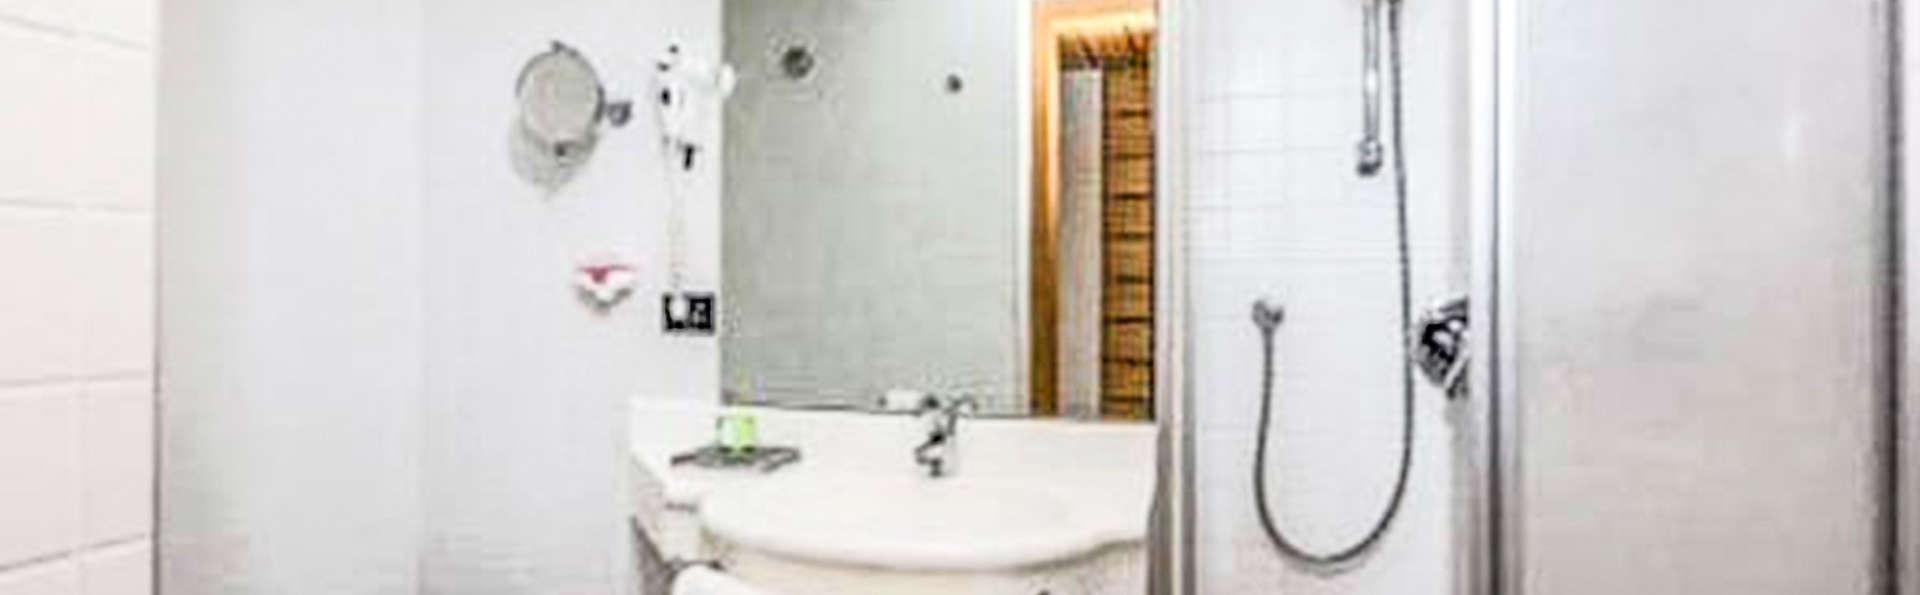 Hotel Mirage - EDIT_BATHROOM_01.jpg